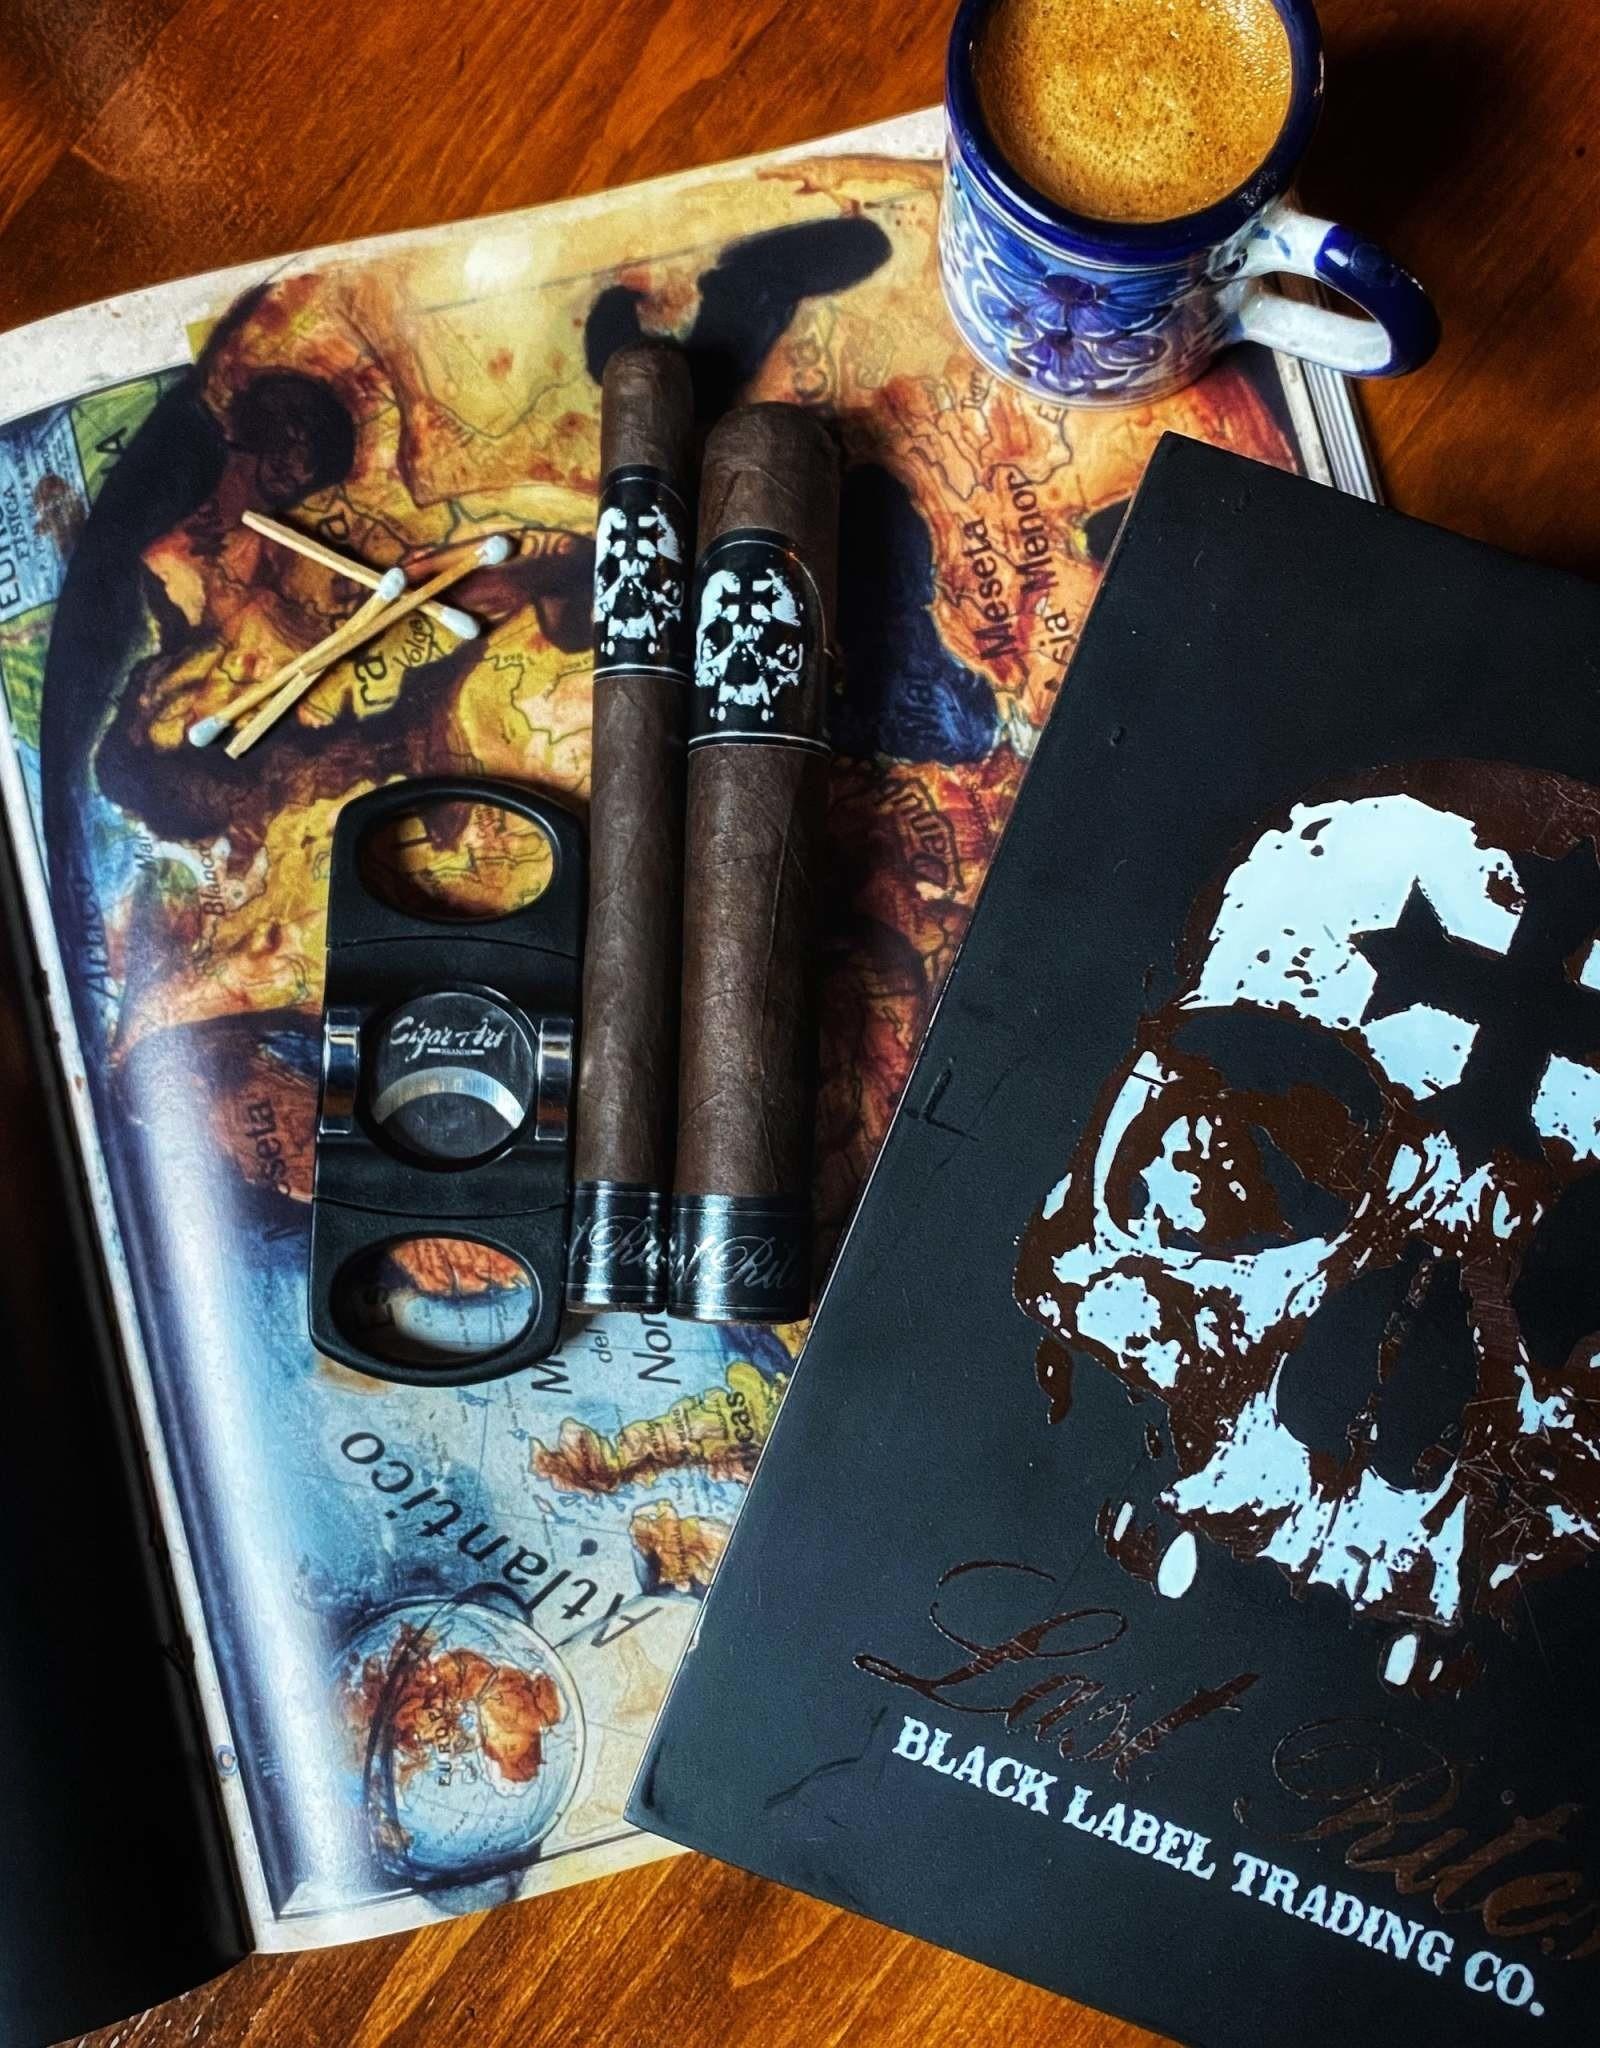 Black Label Trading Co Black Label Trading Co. Last Rites Lancero 6.5 x 42